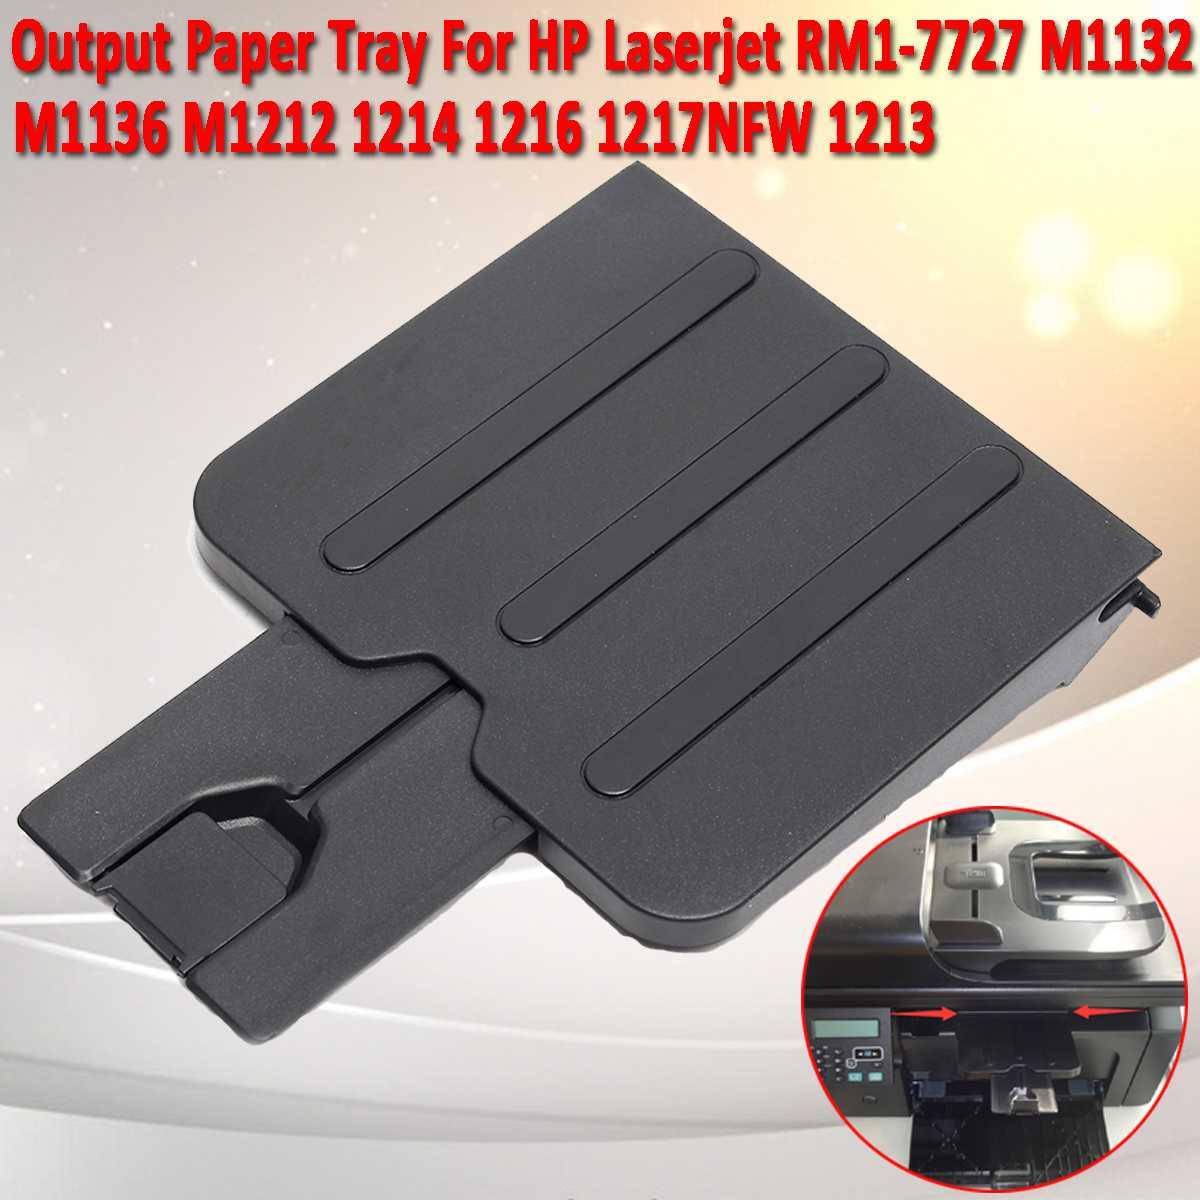 Ausgang Papier Fach Für Laserjet RM1-7727 M1132 M1136 M1212 1214 1216 1217NFW 108x118mm